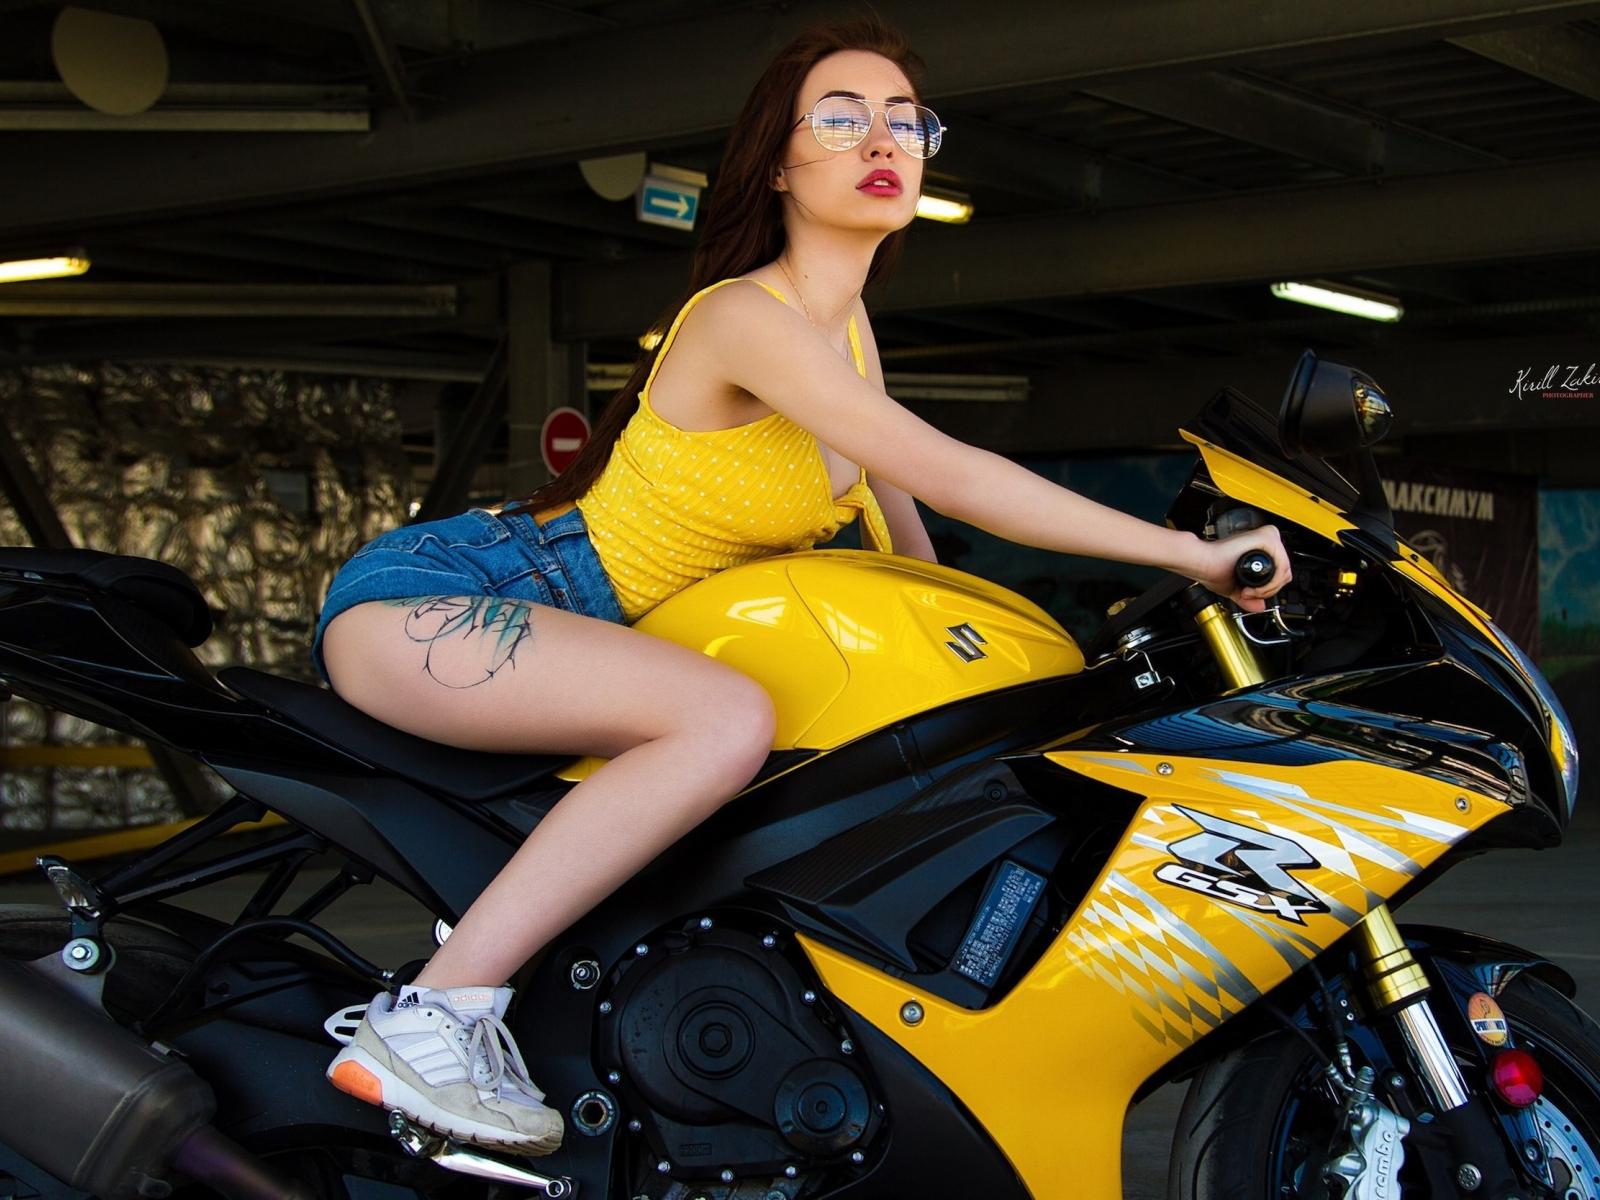 Bike and woman, sports bike, short jeans, 1600x1200 wallpaper